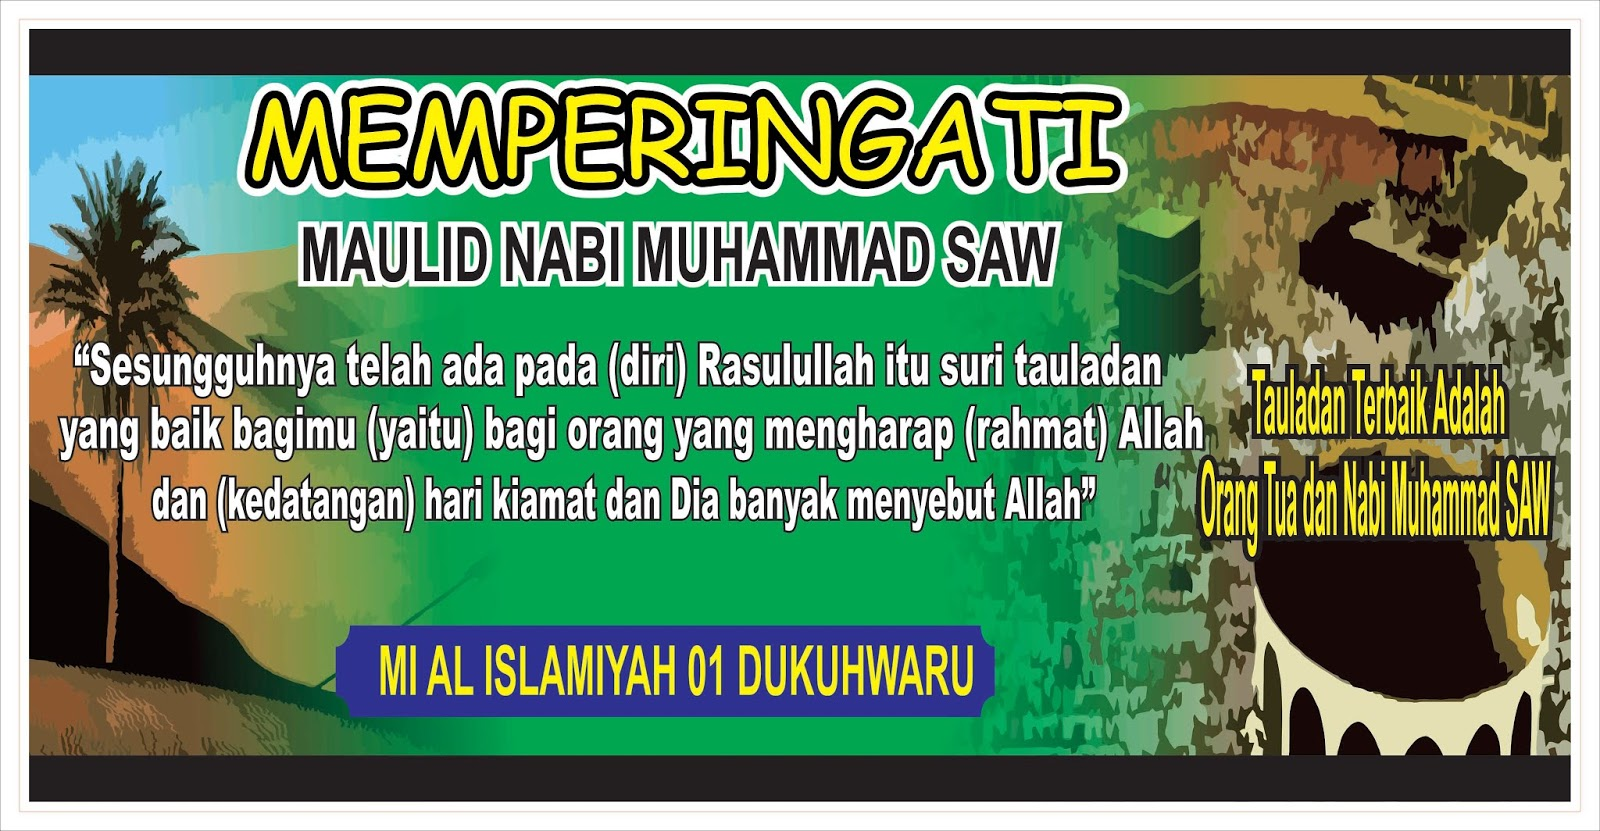 Contoh Desain Banner / Spanduk Maulid Nabi Muhammad SAW ...